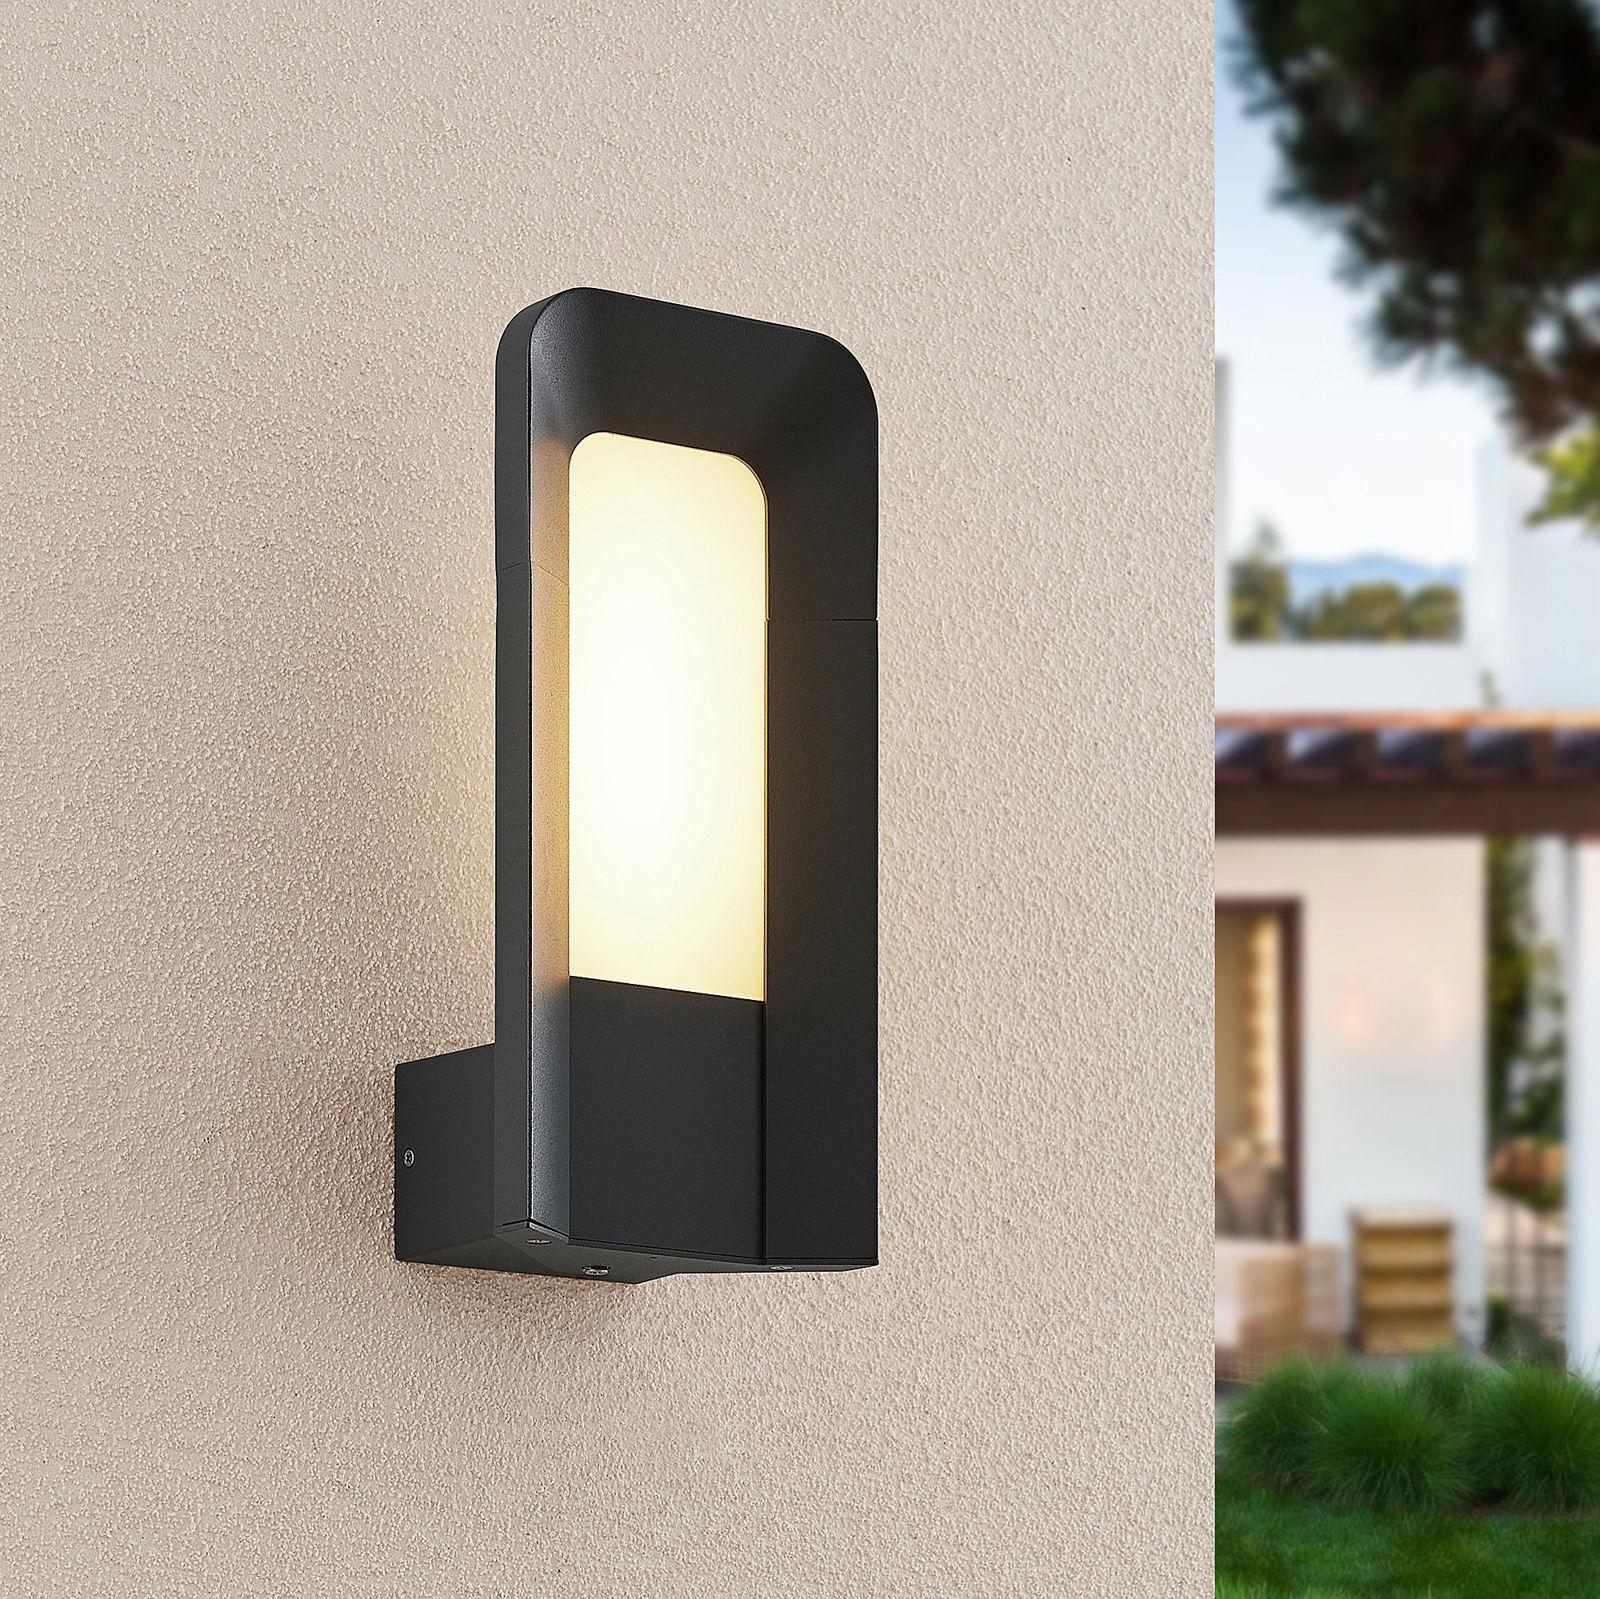 Lucande Secunda kinkiet zewnętrzny LED